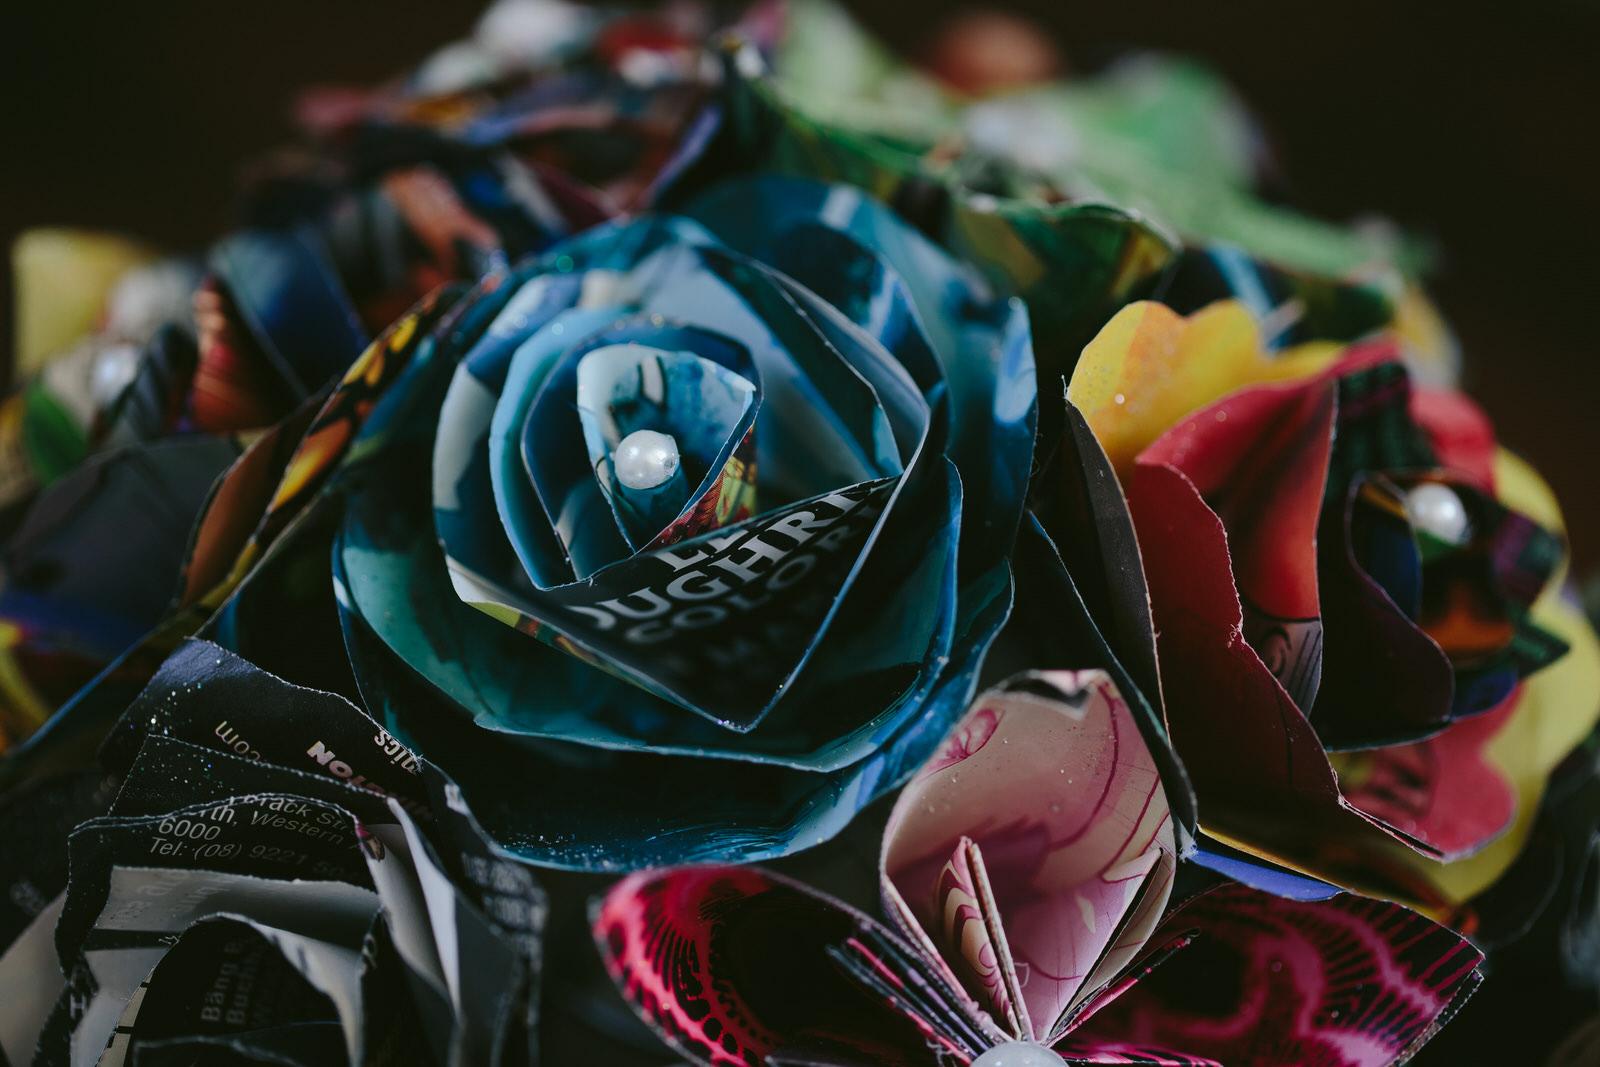 diy-comic-book-flowers-etsy-tiny-house-photo.jpg